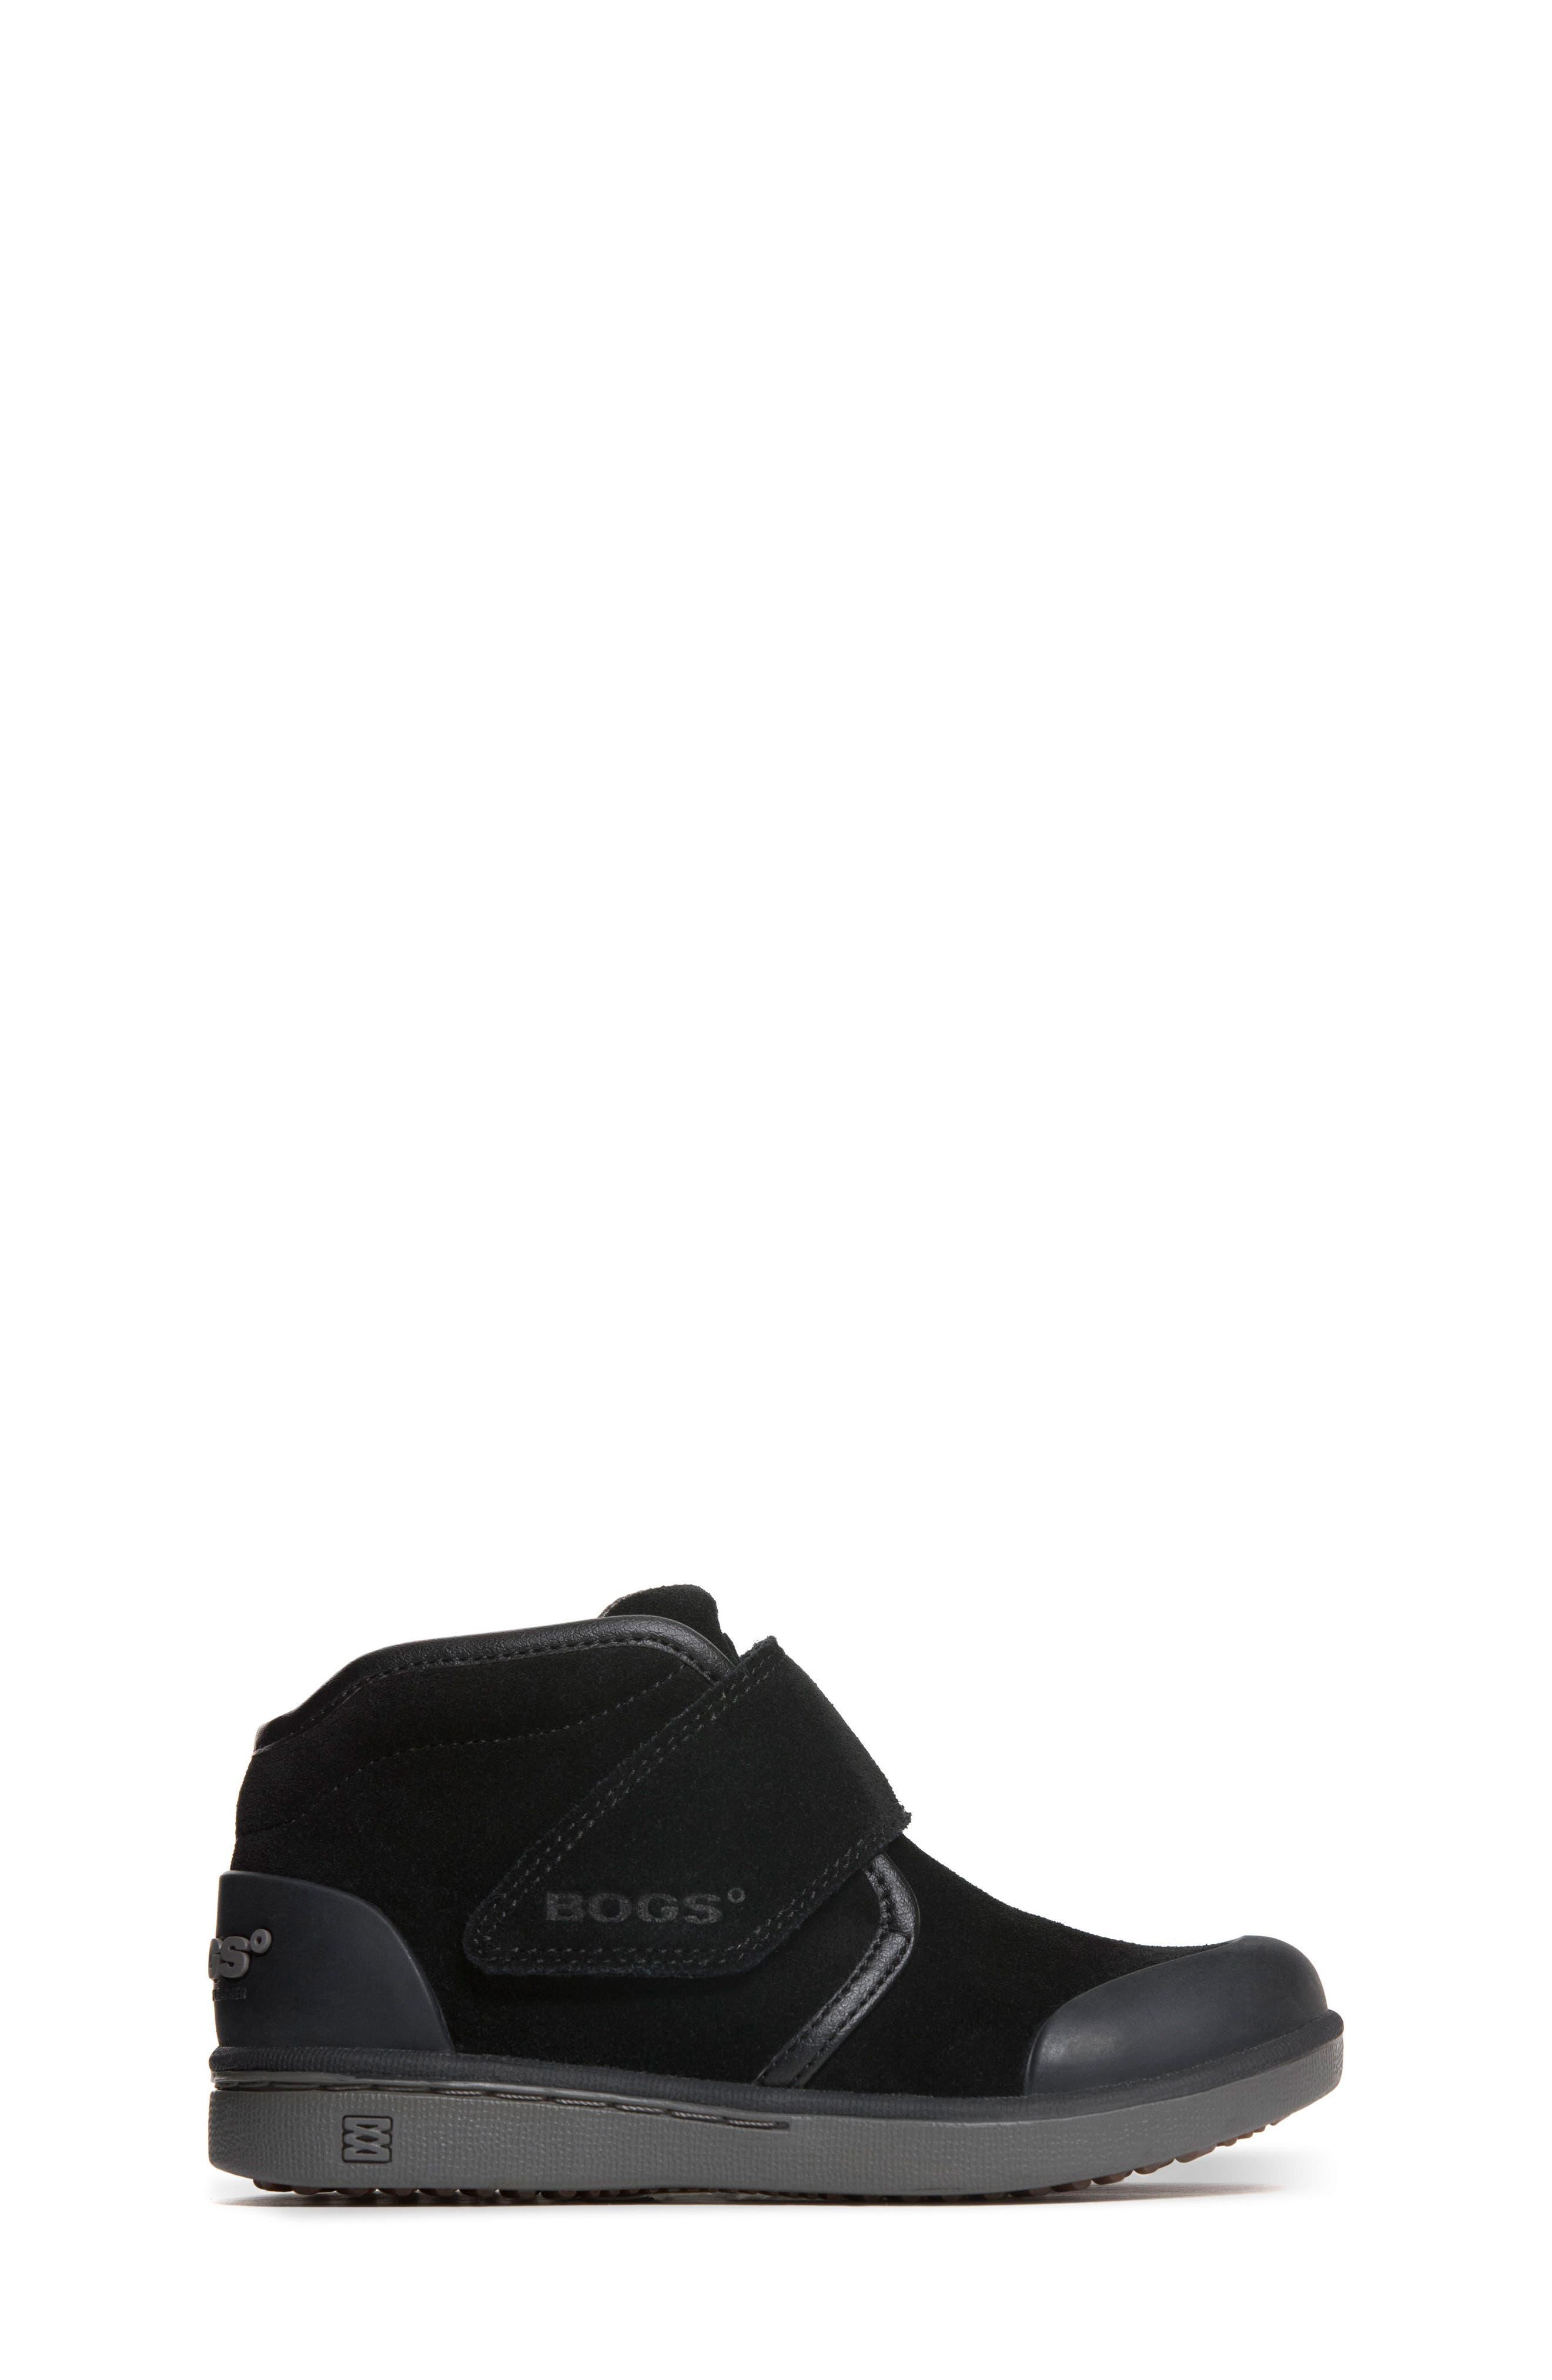 'Sammy' Waterproof Sneaker,                             Alternate thumbnail 3, color,                             BLACK/ BLACK